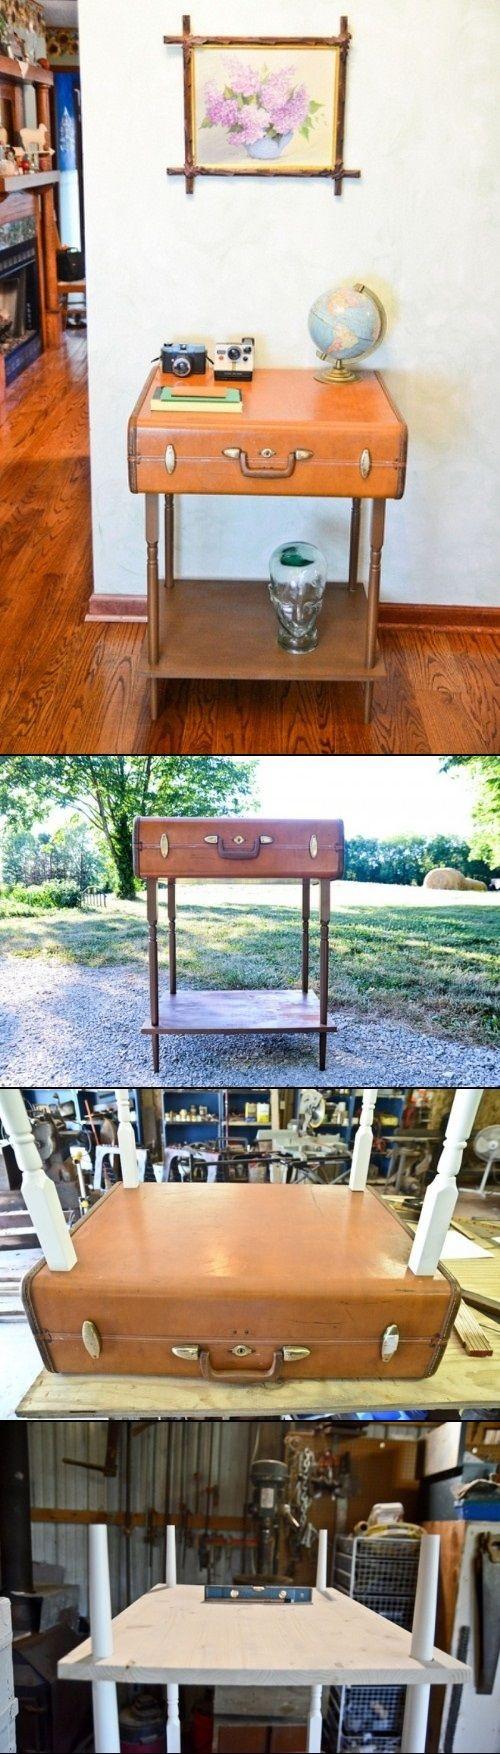 diy suitcase furniture das gef llt mir sehr sehr gut wg pinterest. Black Bedroom Furniture Sets. Home Design Ideas